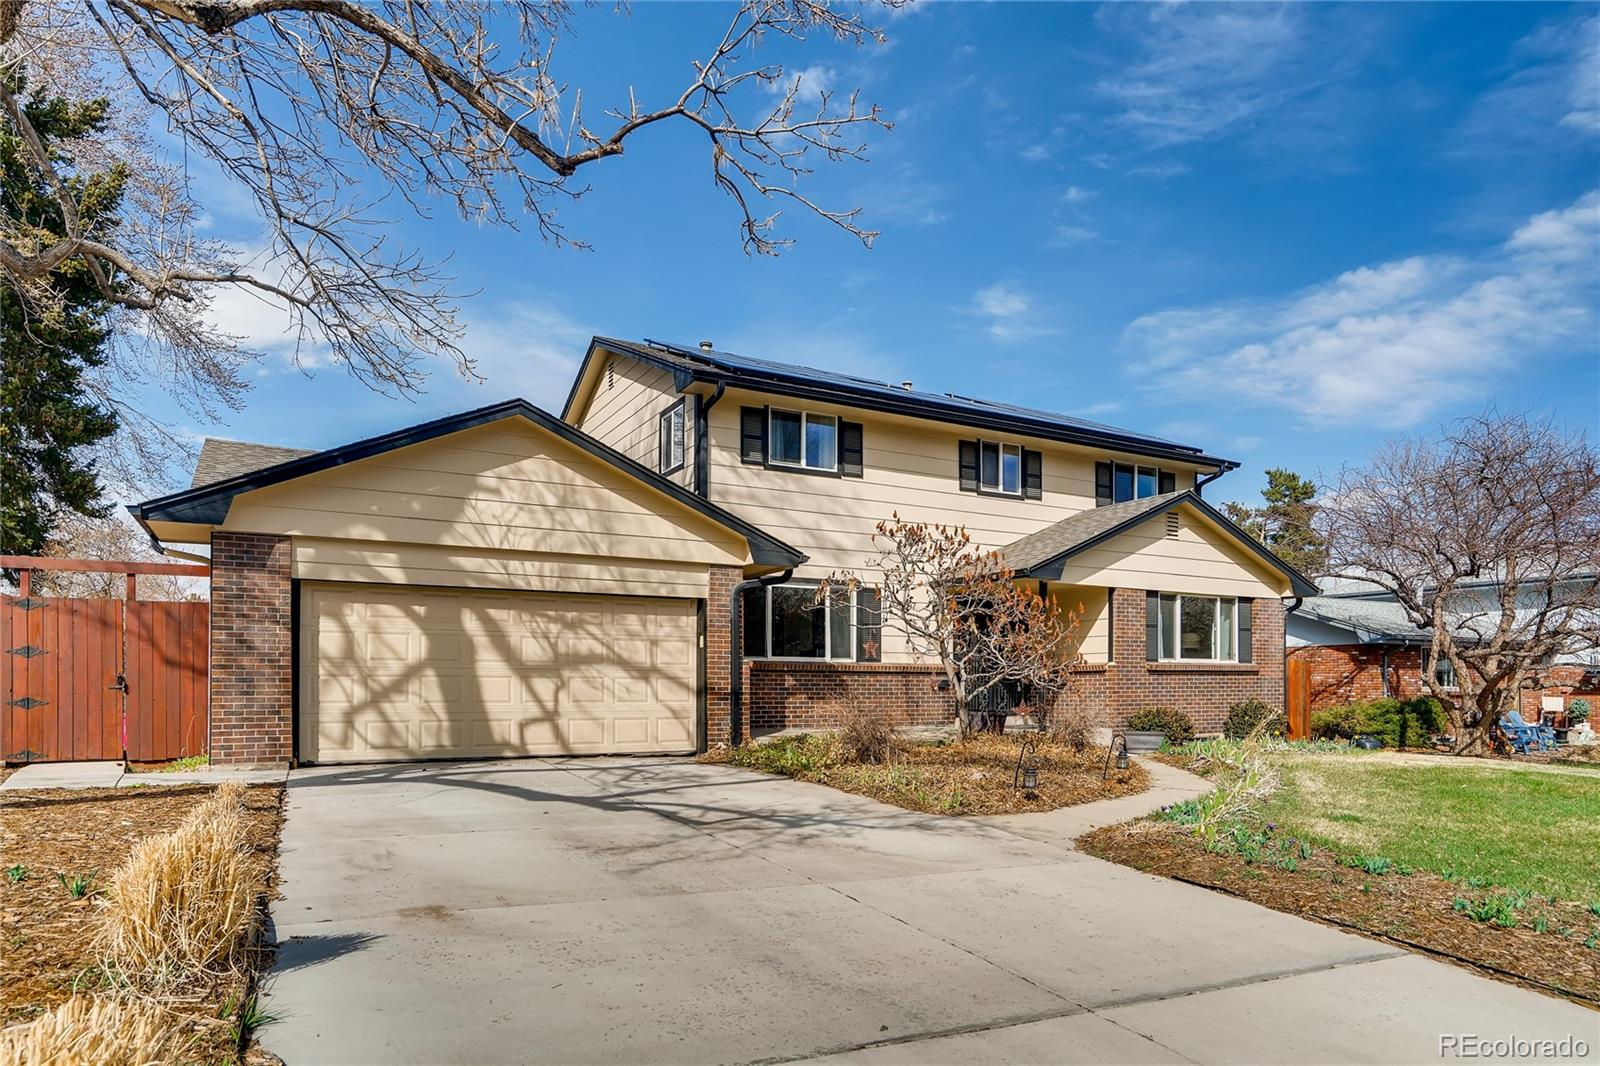 MLS# 9748380 - 1 - 8897 W Woodard Drive, Lakewood, CO 80227